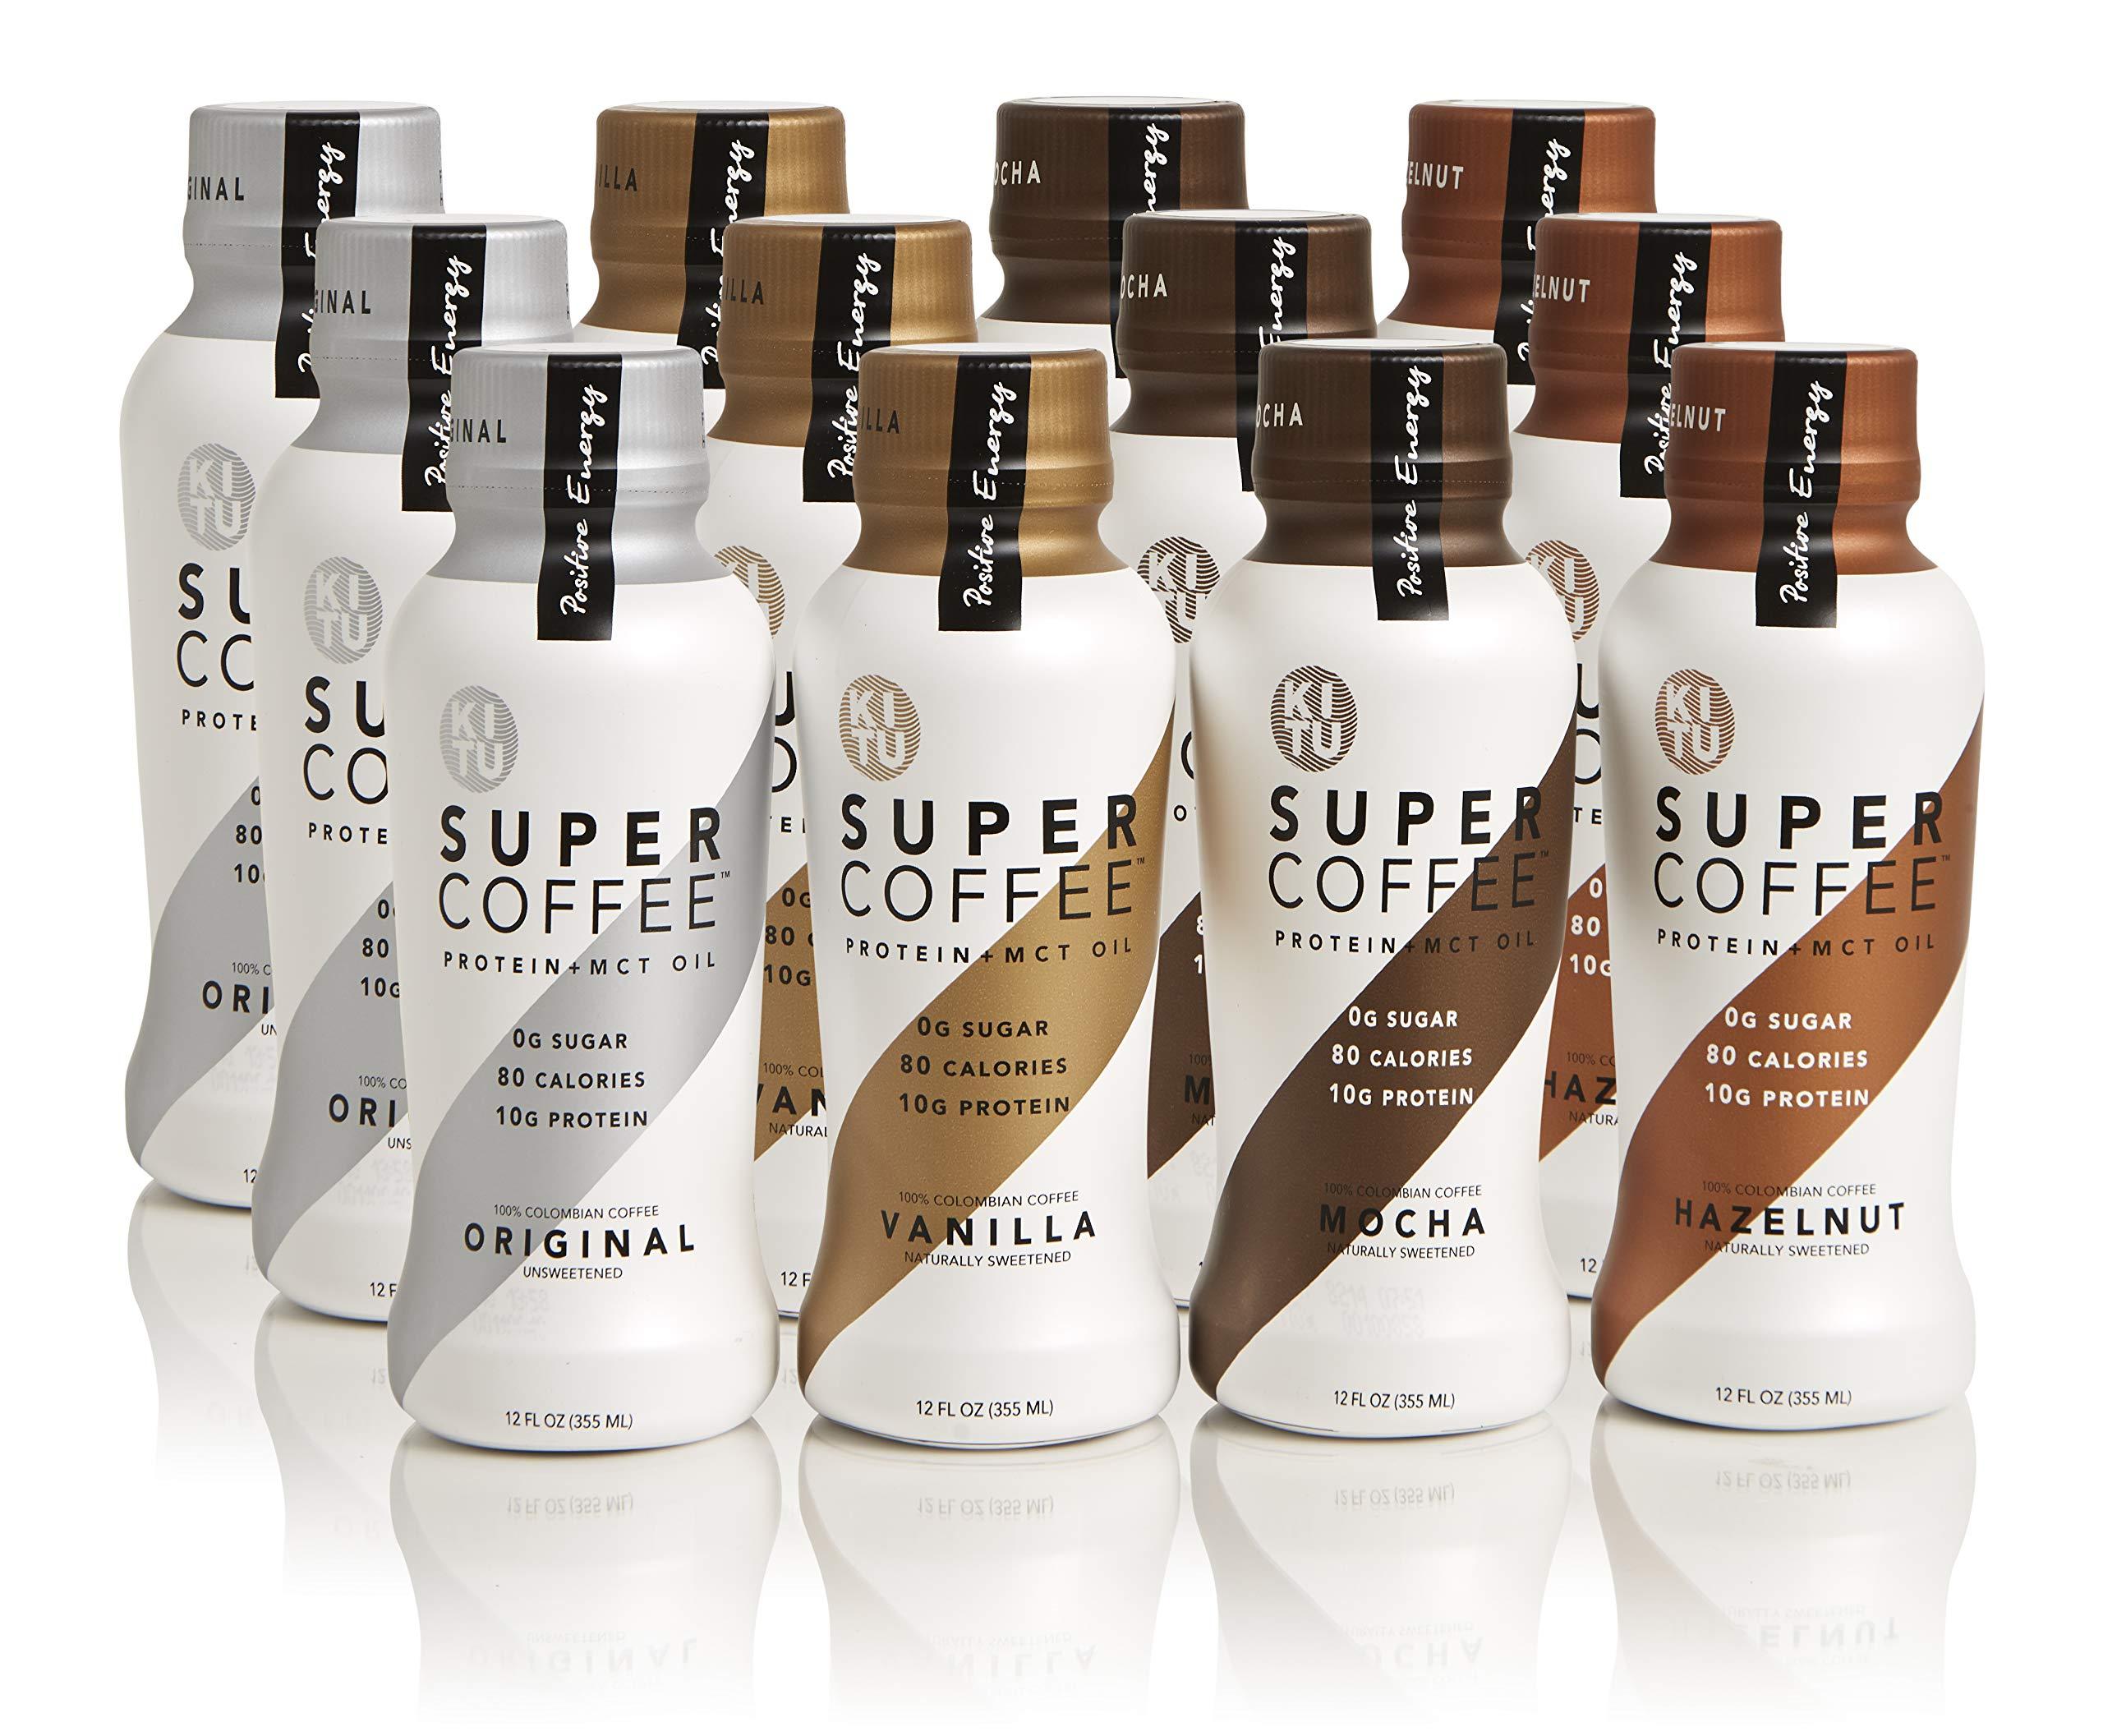 Kitu by Sunniva Super Coffee 12 Variety Pack Sugar-Free Formula, 10g Protein, Lactose Free, Soy Free, Gluten Free (3 each of Vanilla Bean, Mocha, Hazelnut, and Creamy Black)